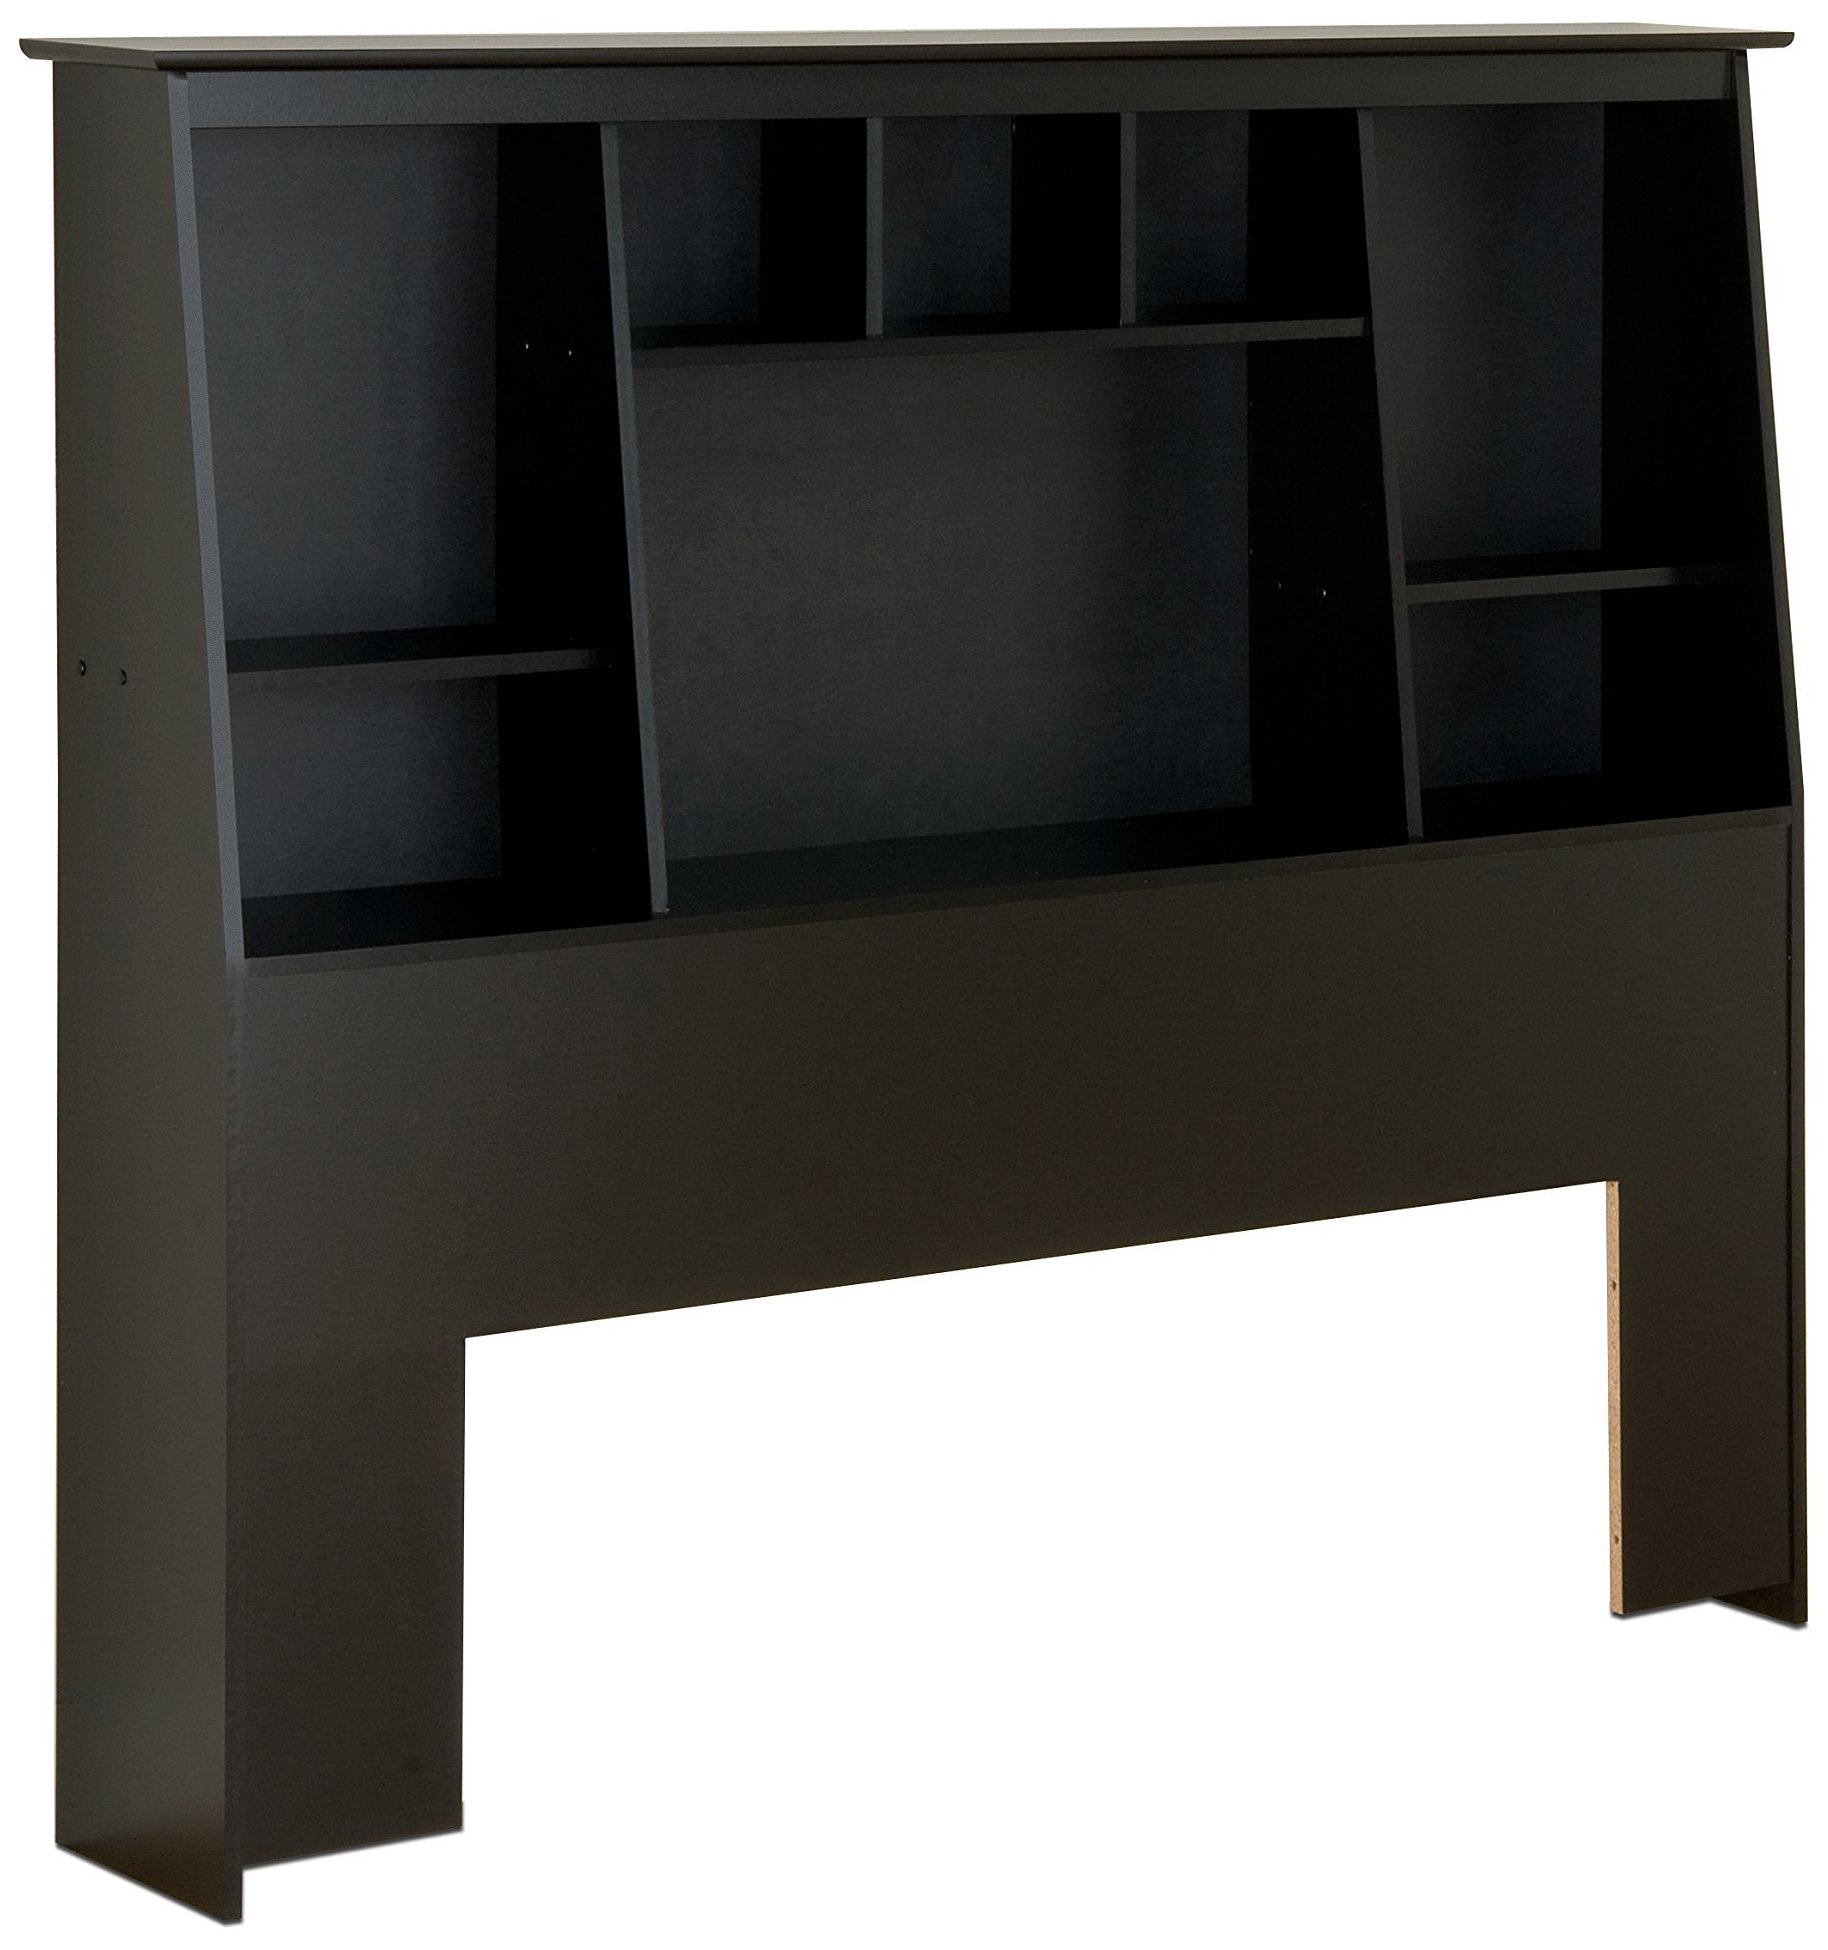 Prepac BSH-6656 Tall Slant-Back Bookcase Headboard, Black, Full/Queen